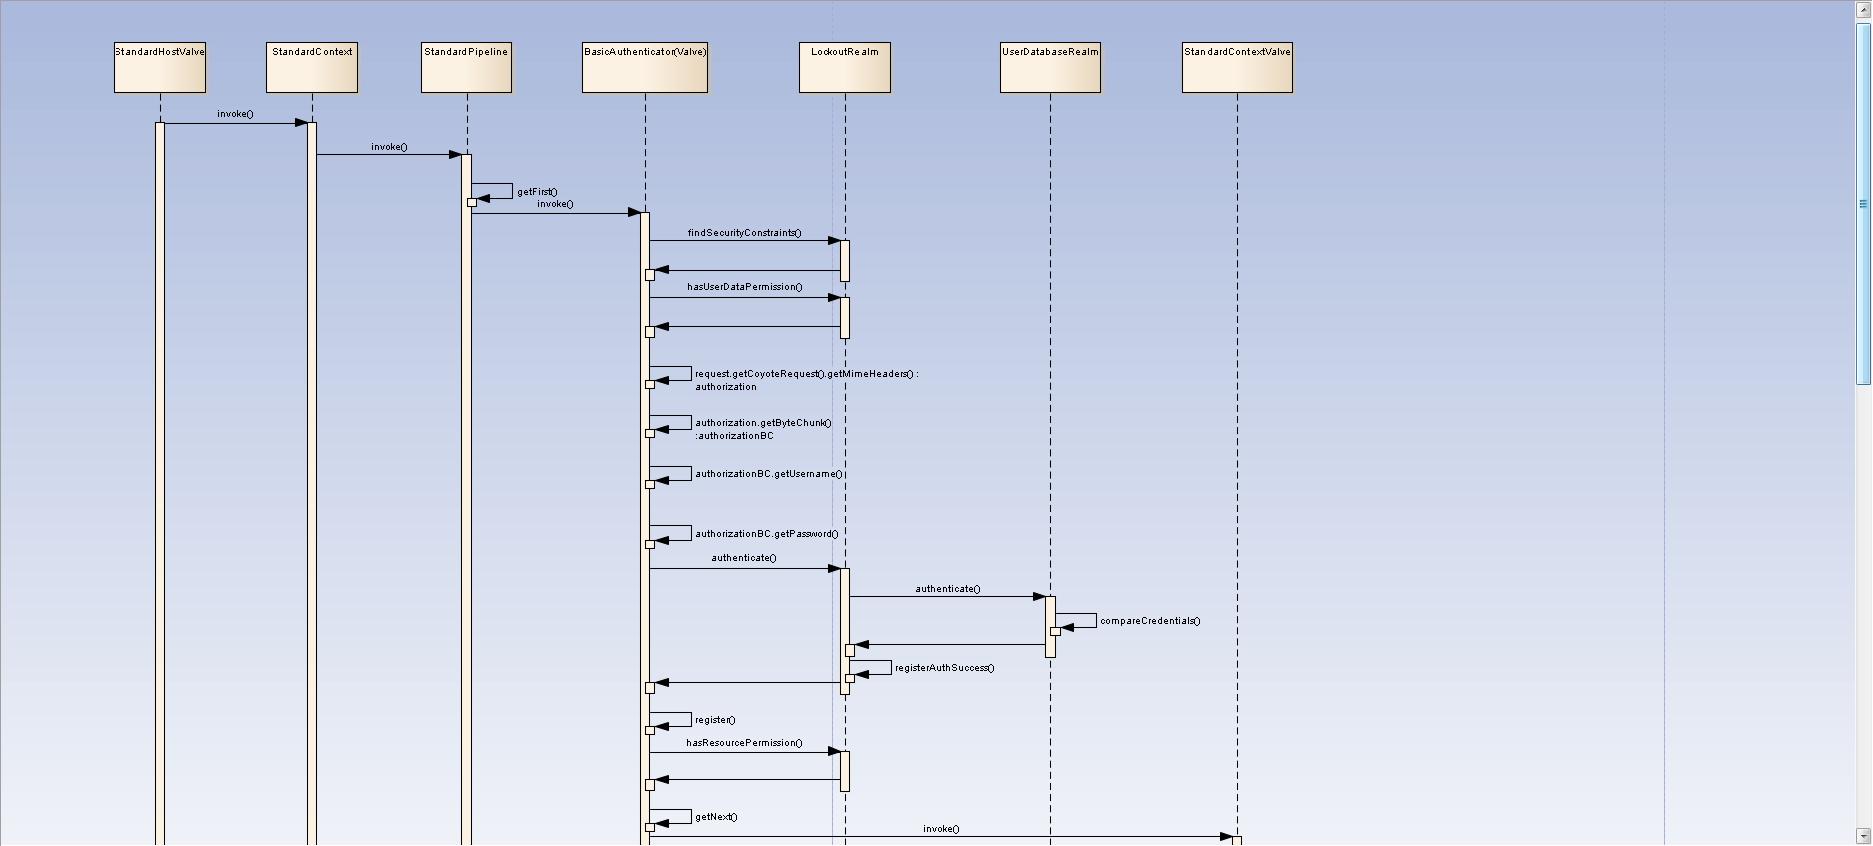 Apache tomcat 8 architecture 8534 request process flow request process flow ccuart Images